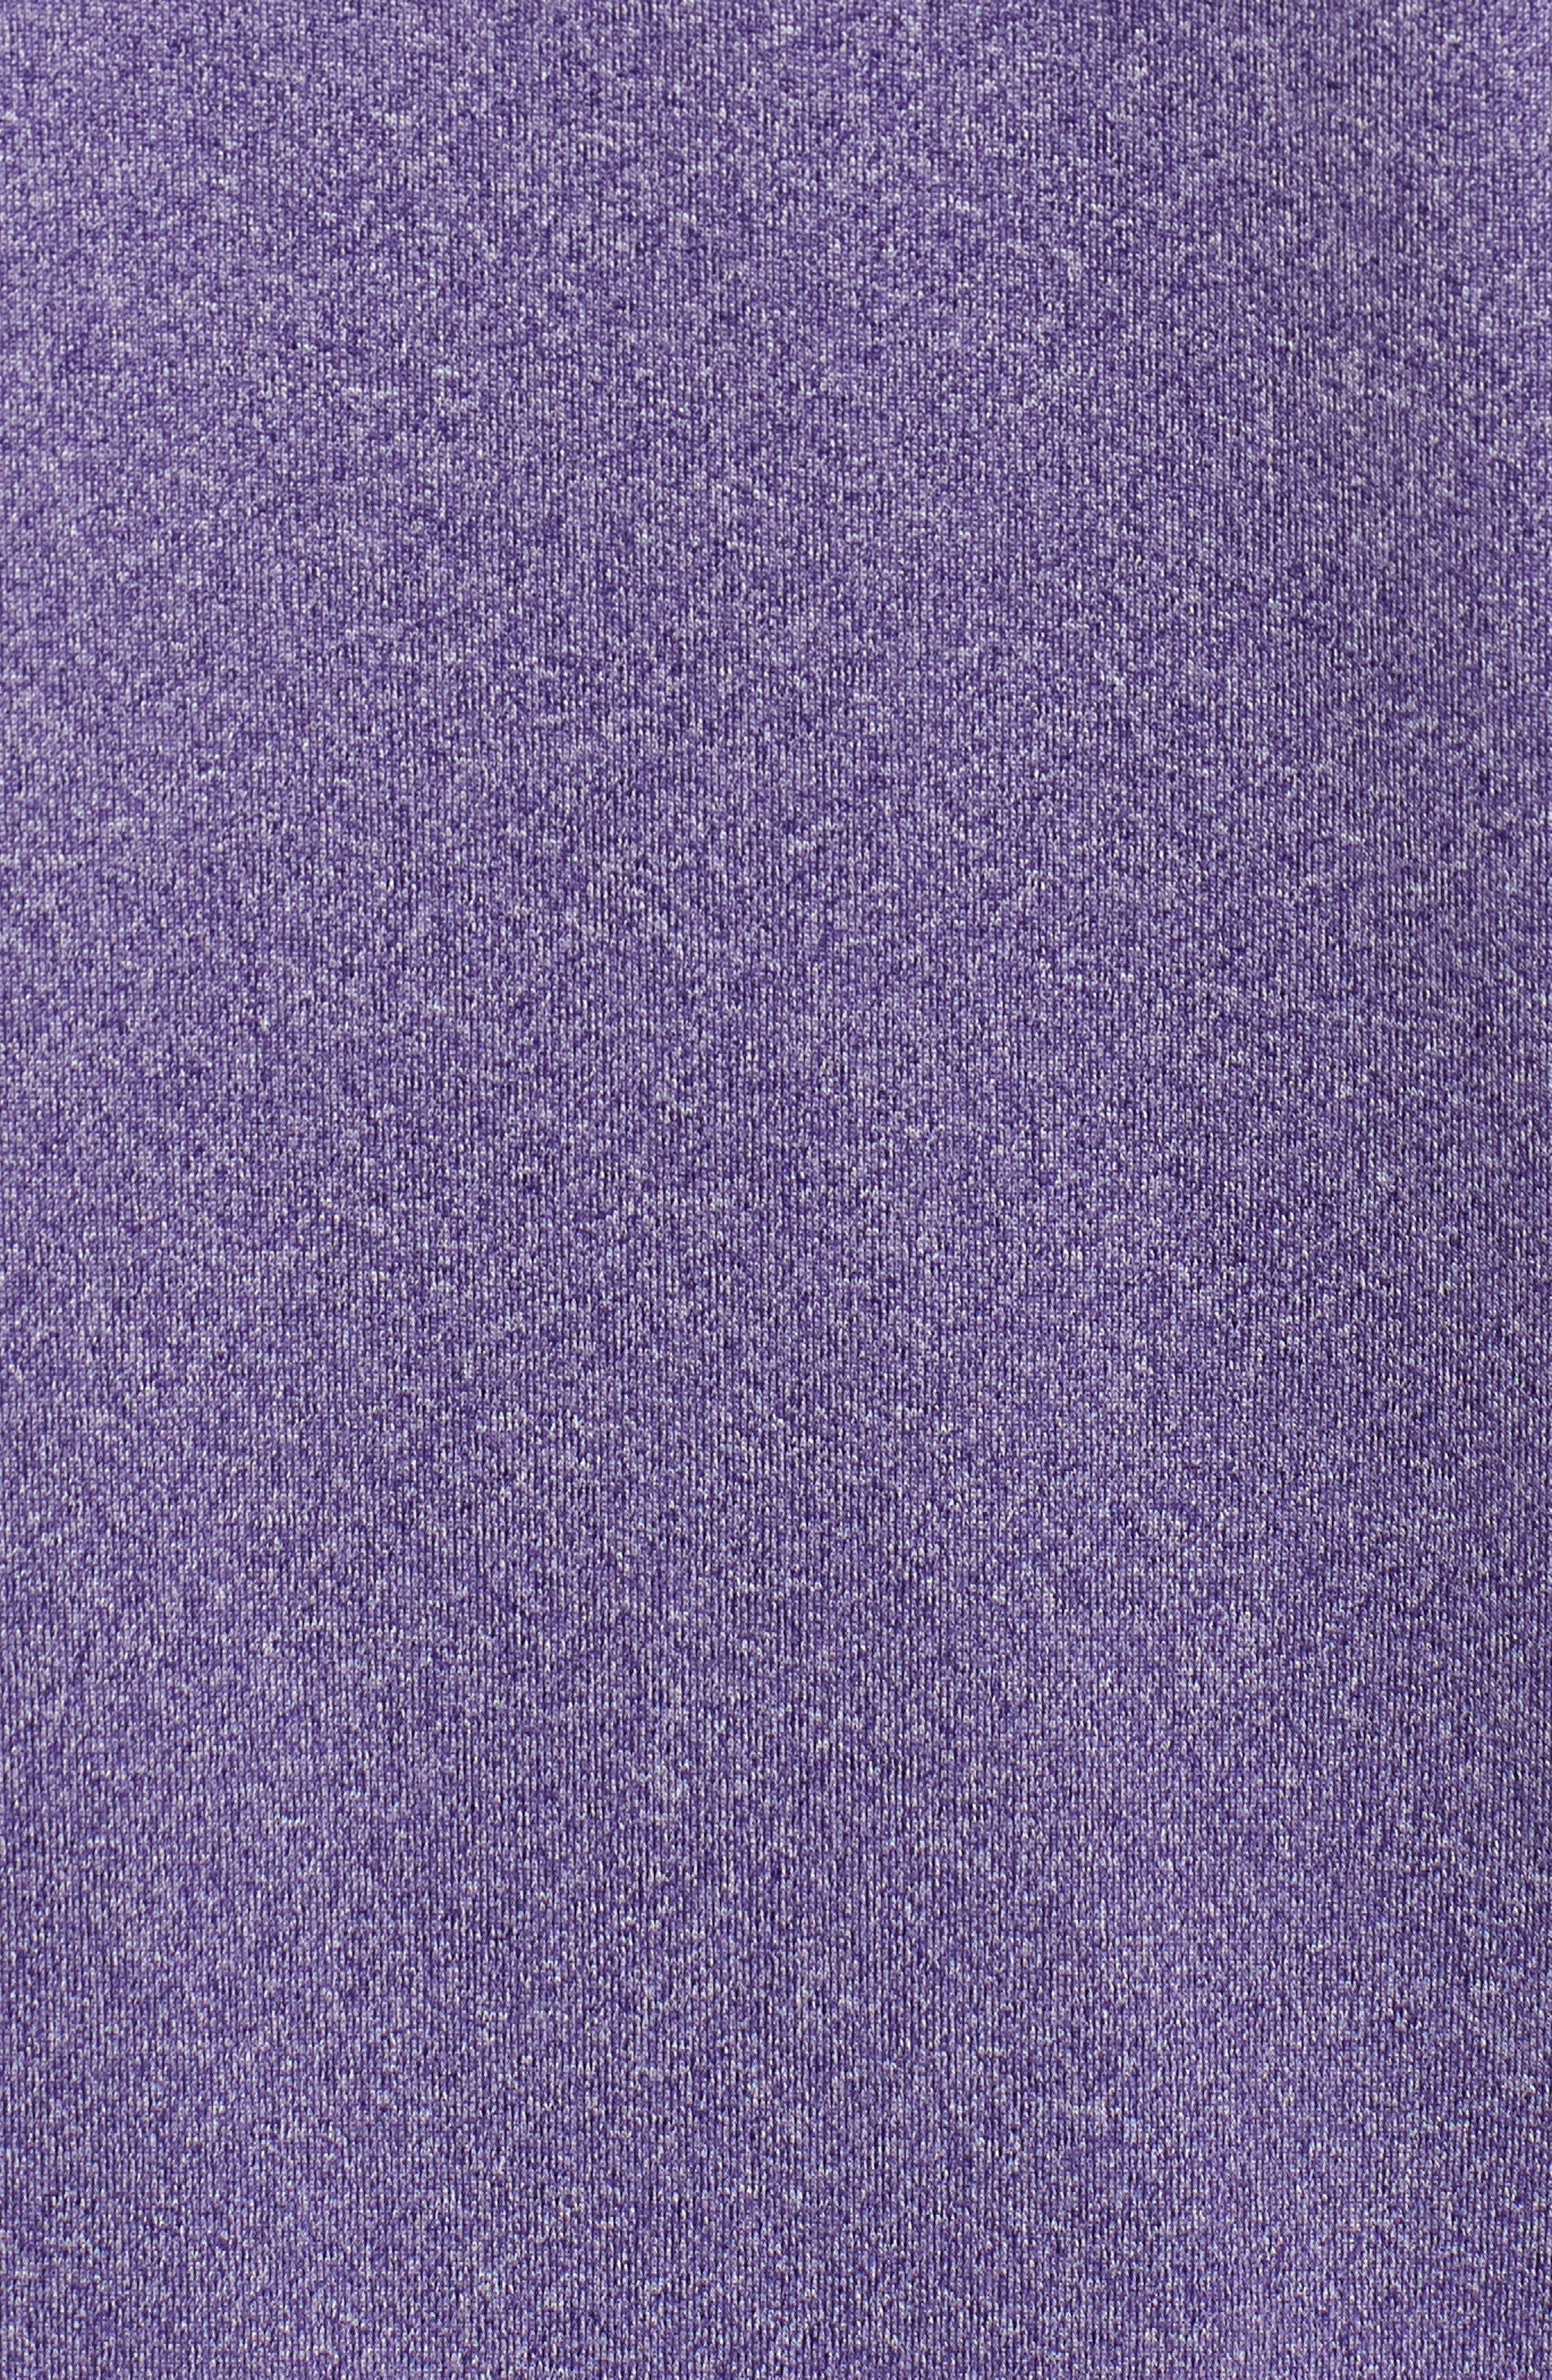 Endurance Baltimore Ravens Regular Fit Pullover,                             Alternate thumbnail 5, color,                             COLLEGE PURPLE HEATHER